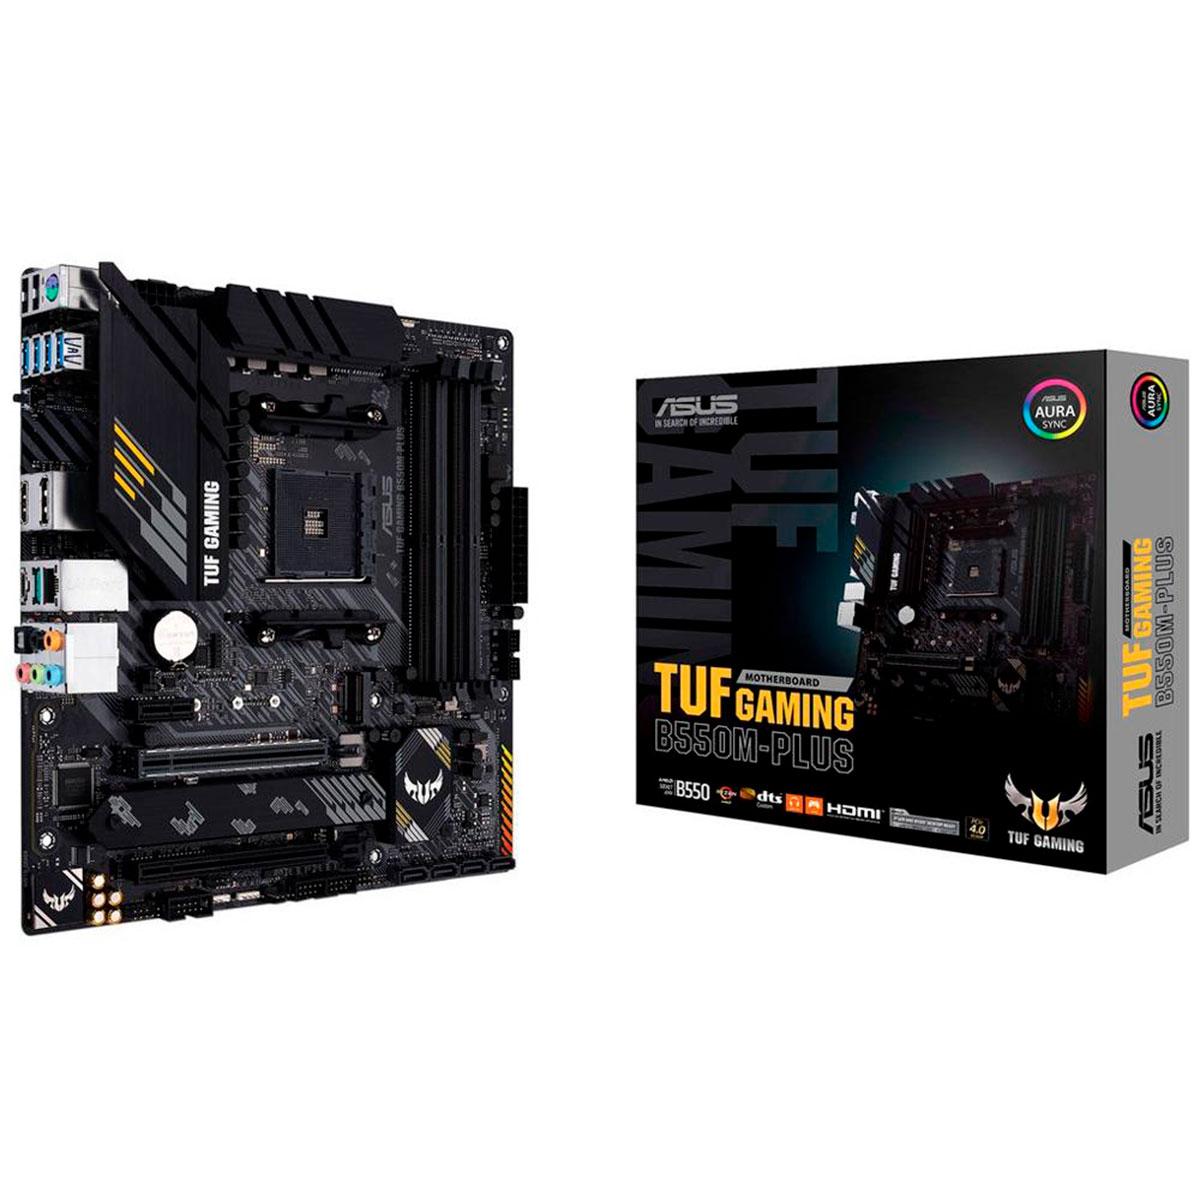 Placa Mãe Asus TUF Gaming B550M-PLUS, AMD AM4, DDR4, mATX